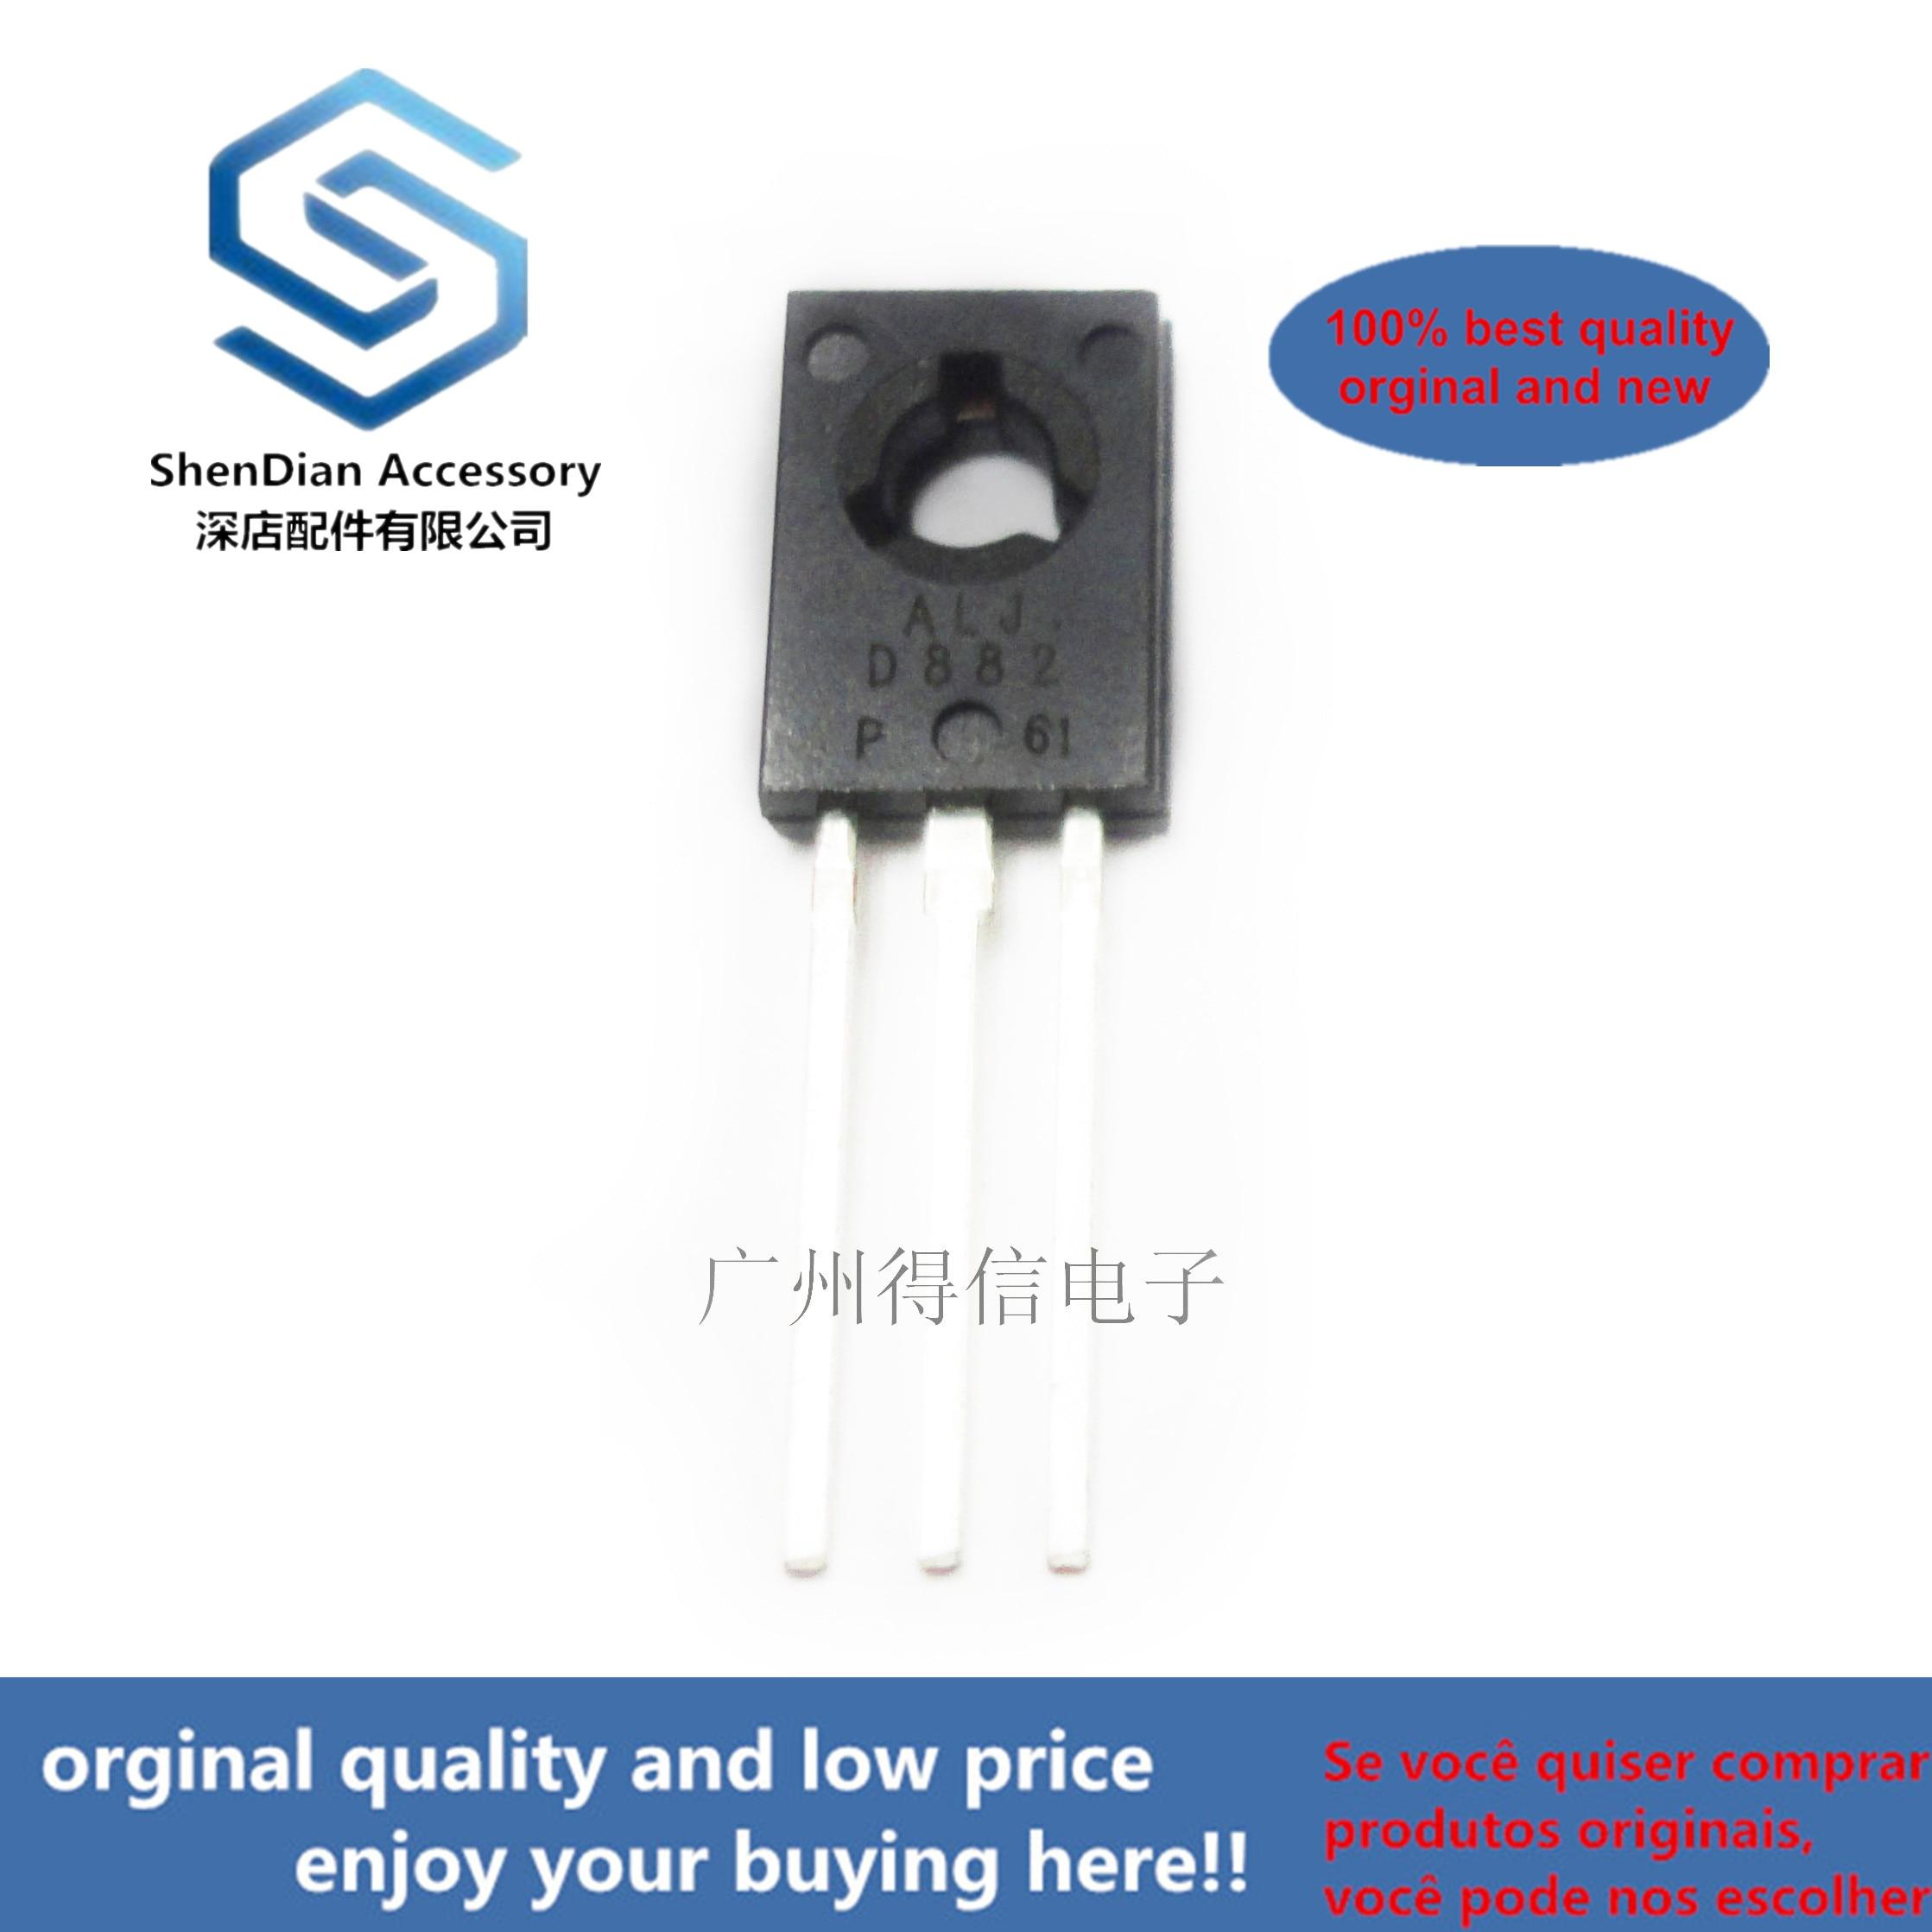 30pcs 100% Orginal New D882P D882 To-126 Bipolar Junction Transistor Real Photo